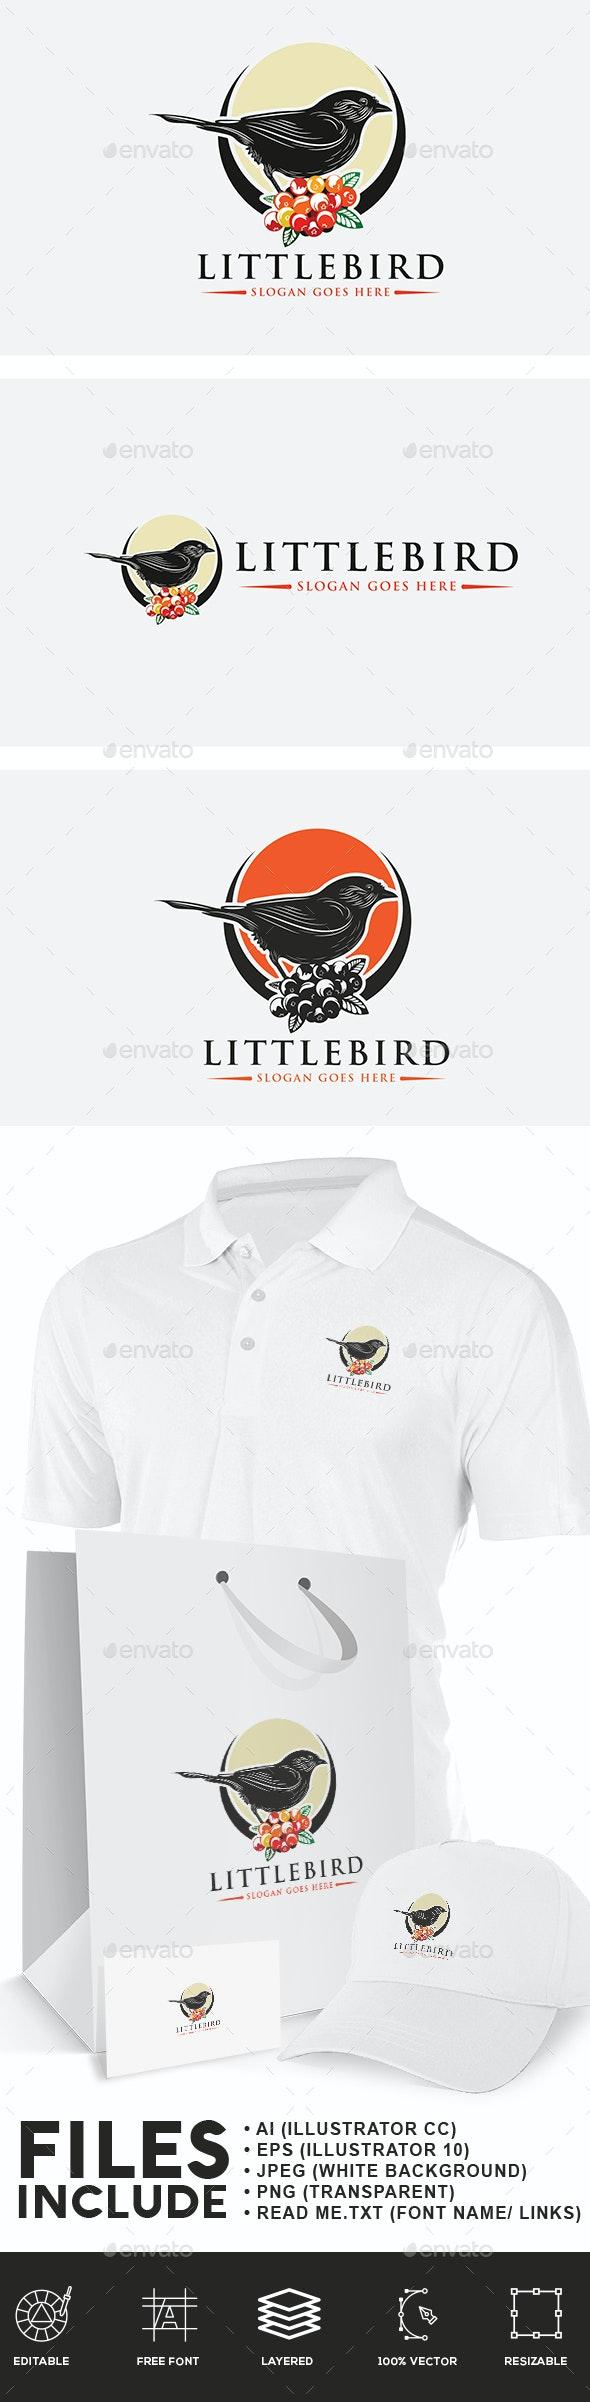 Little Bird Logo - Animals Logo Templates